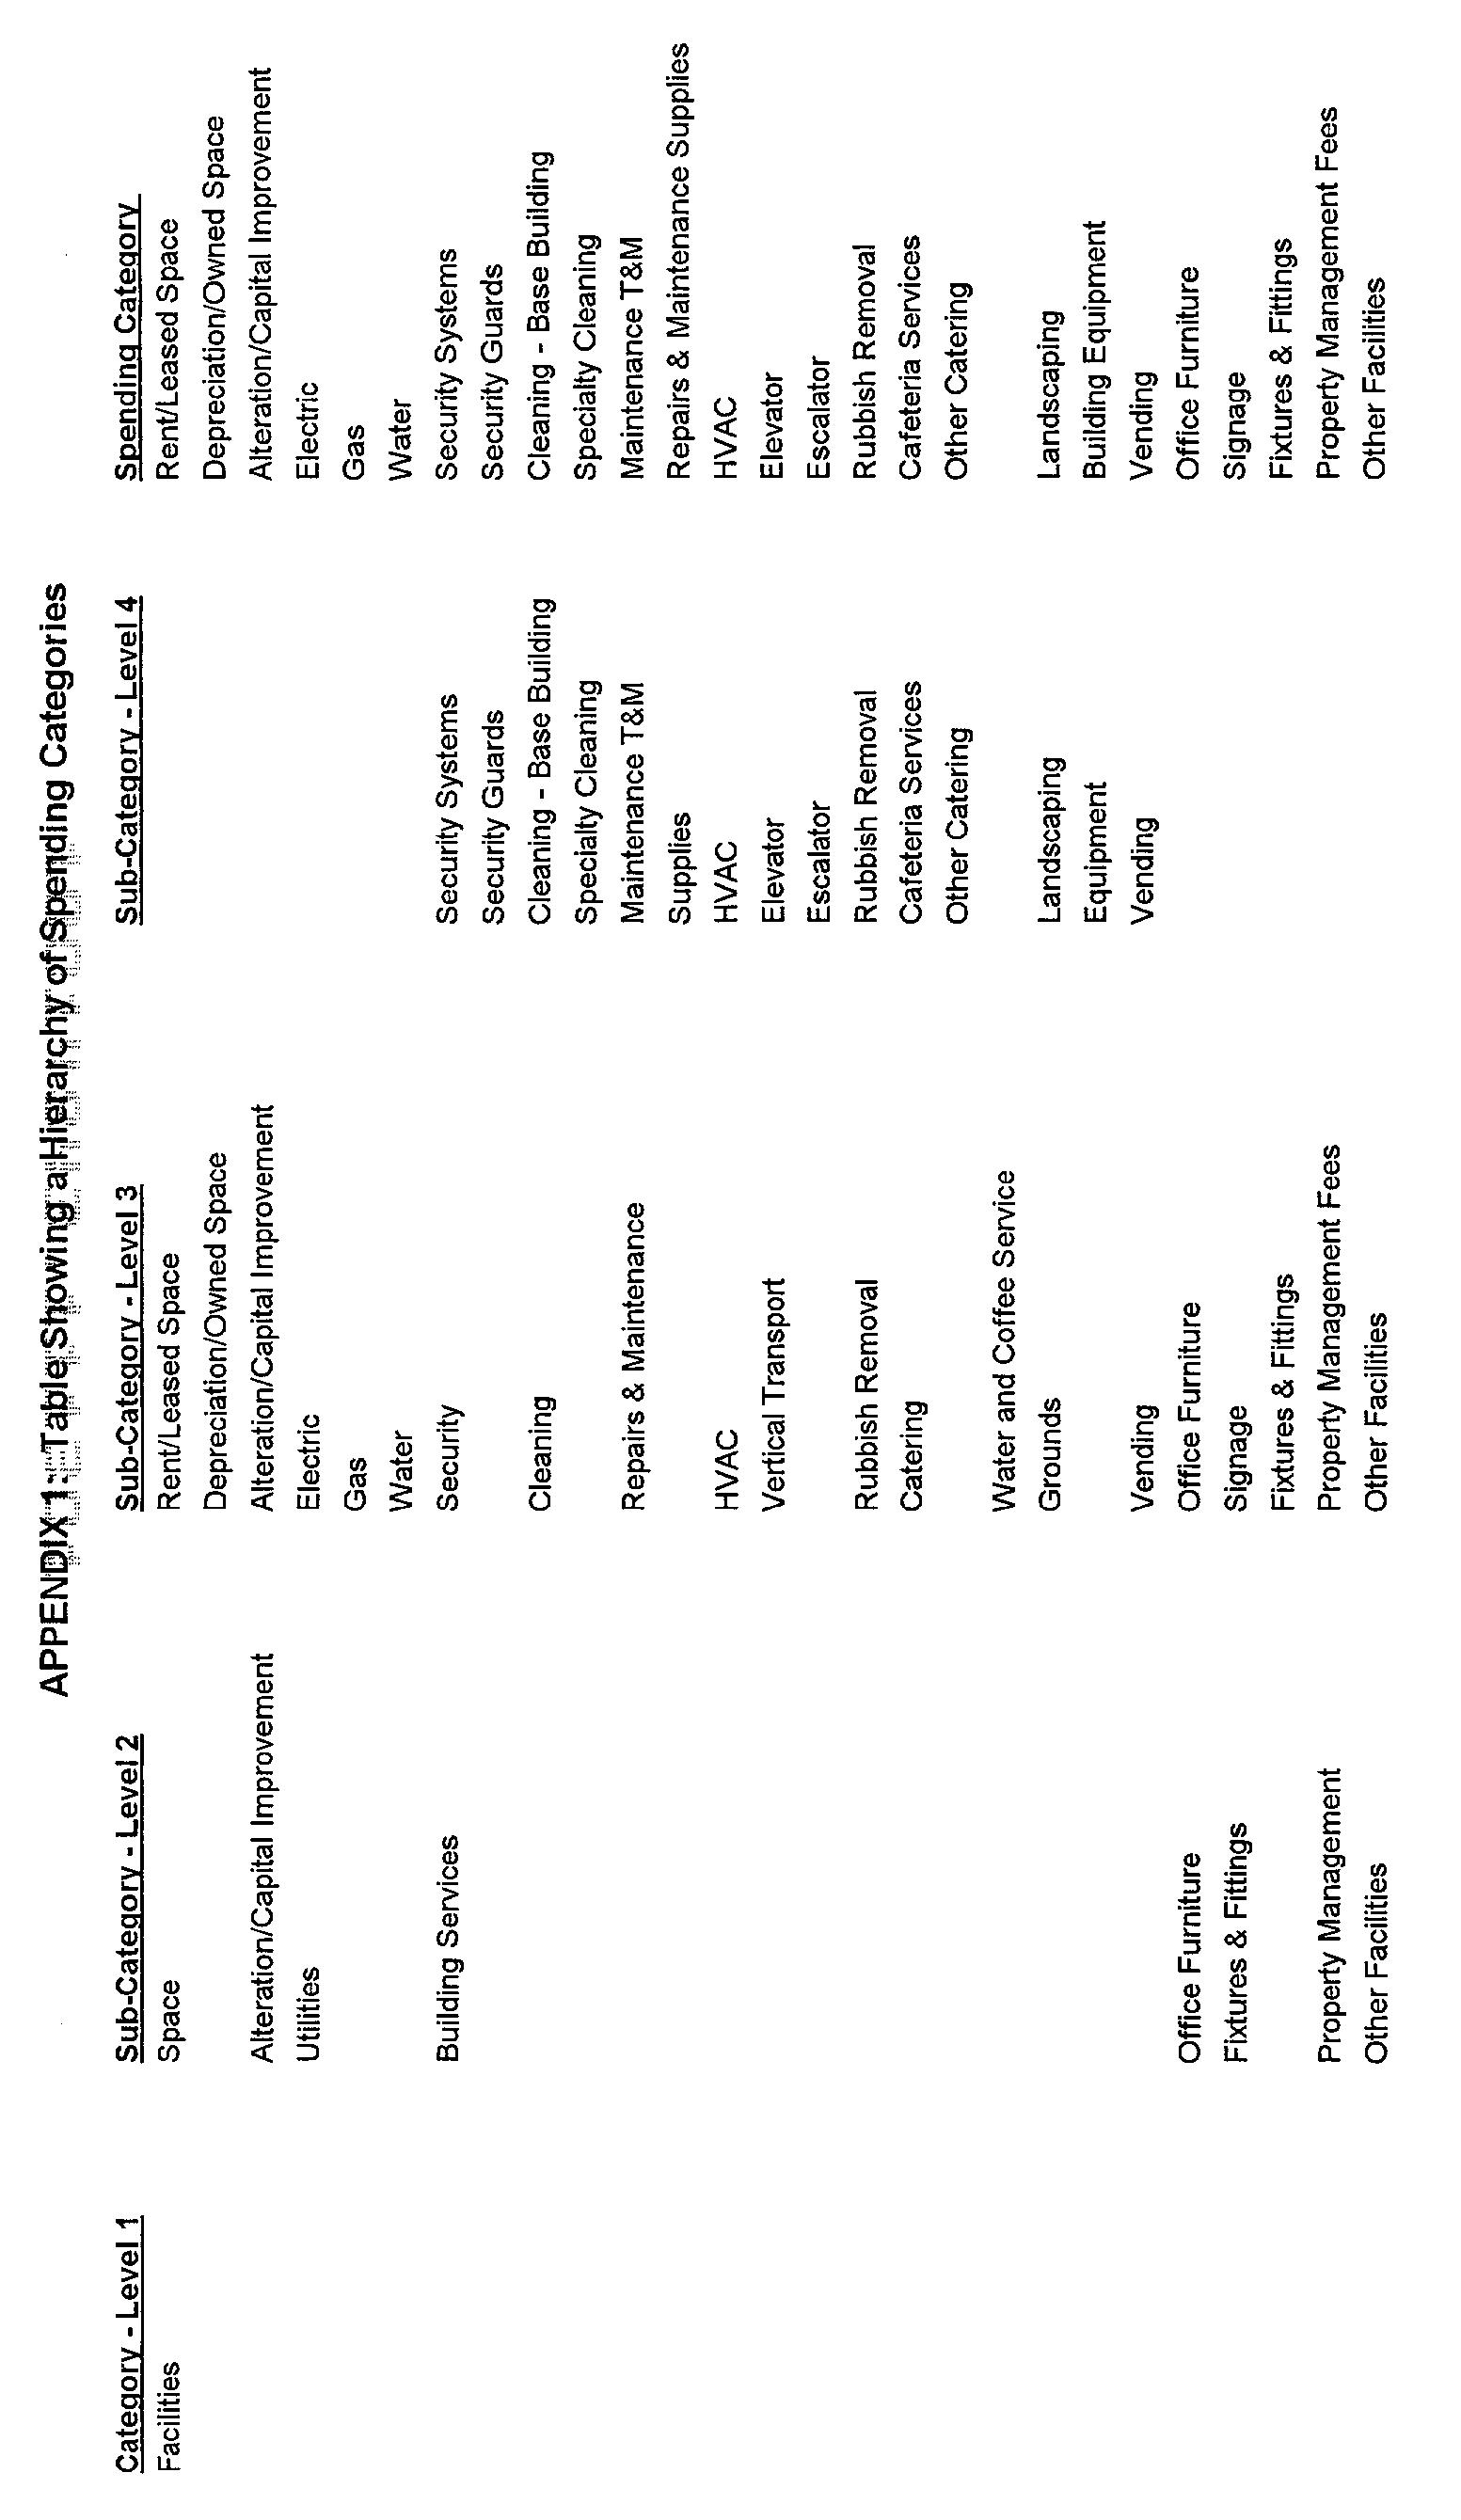 Figure US20020128938A1-20020912-P00004